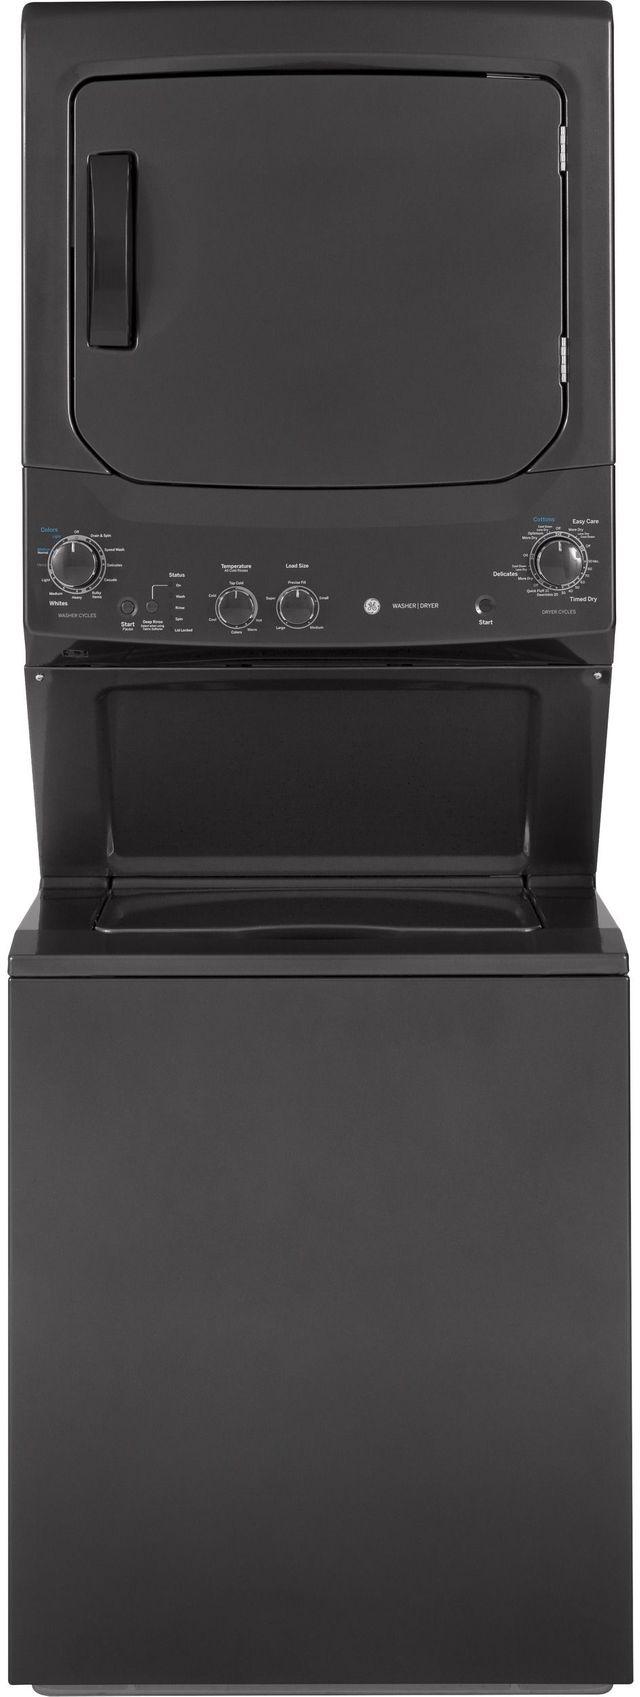 GE® Unitized Spacemaker® Stack Laundry-Diamond Gray-GUD27GSPMDG